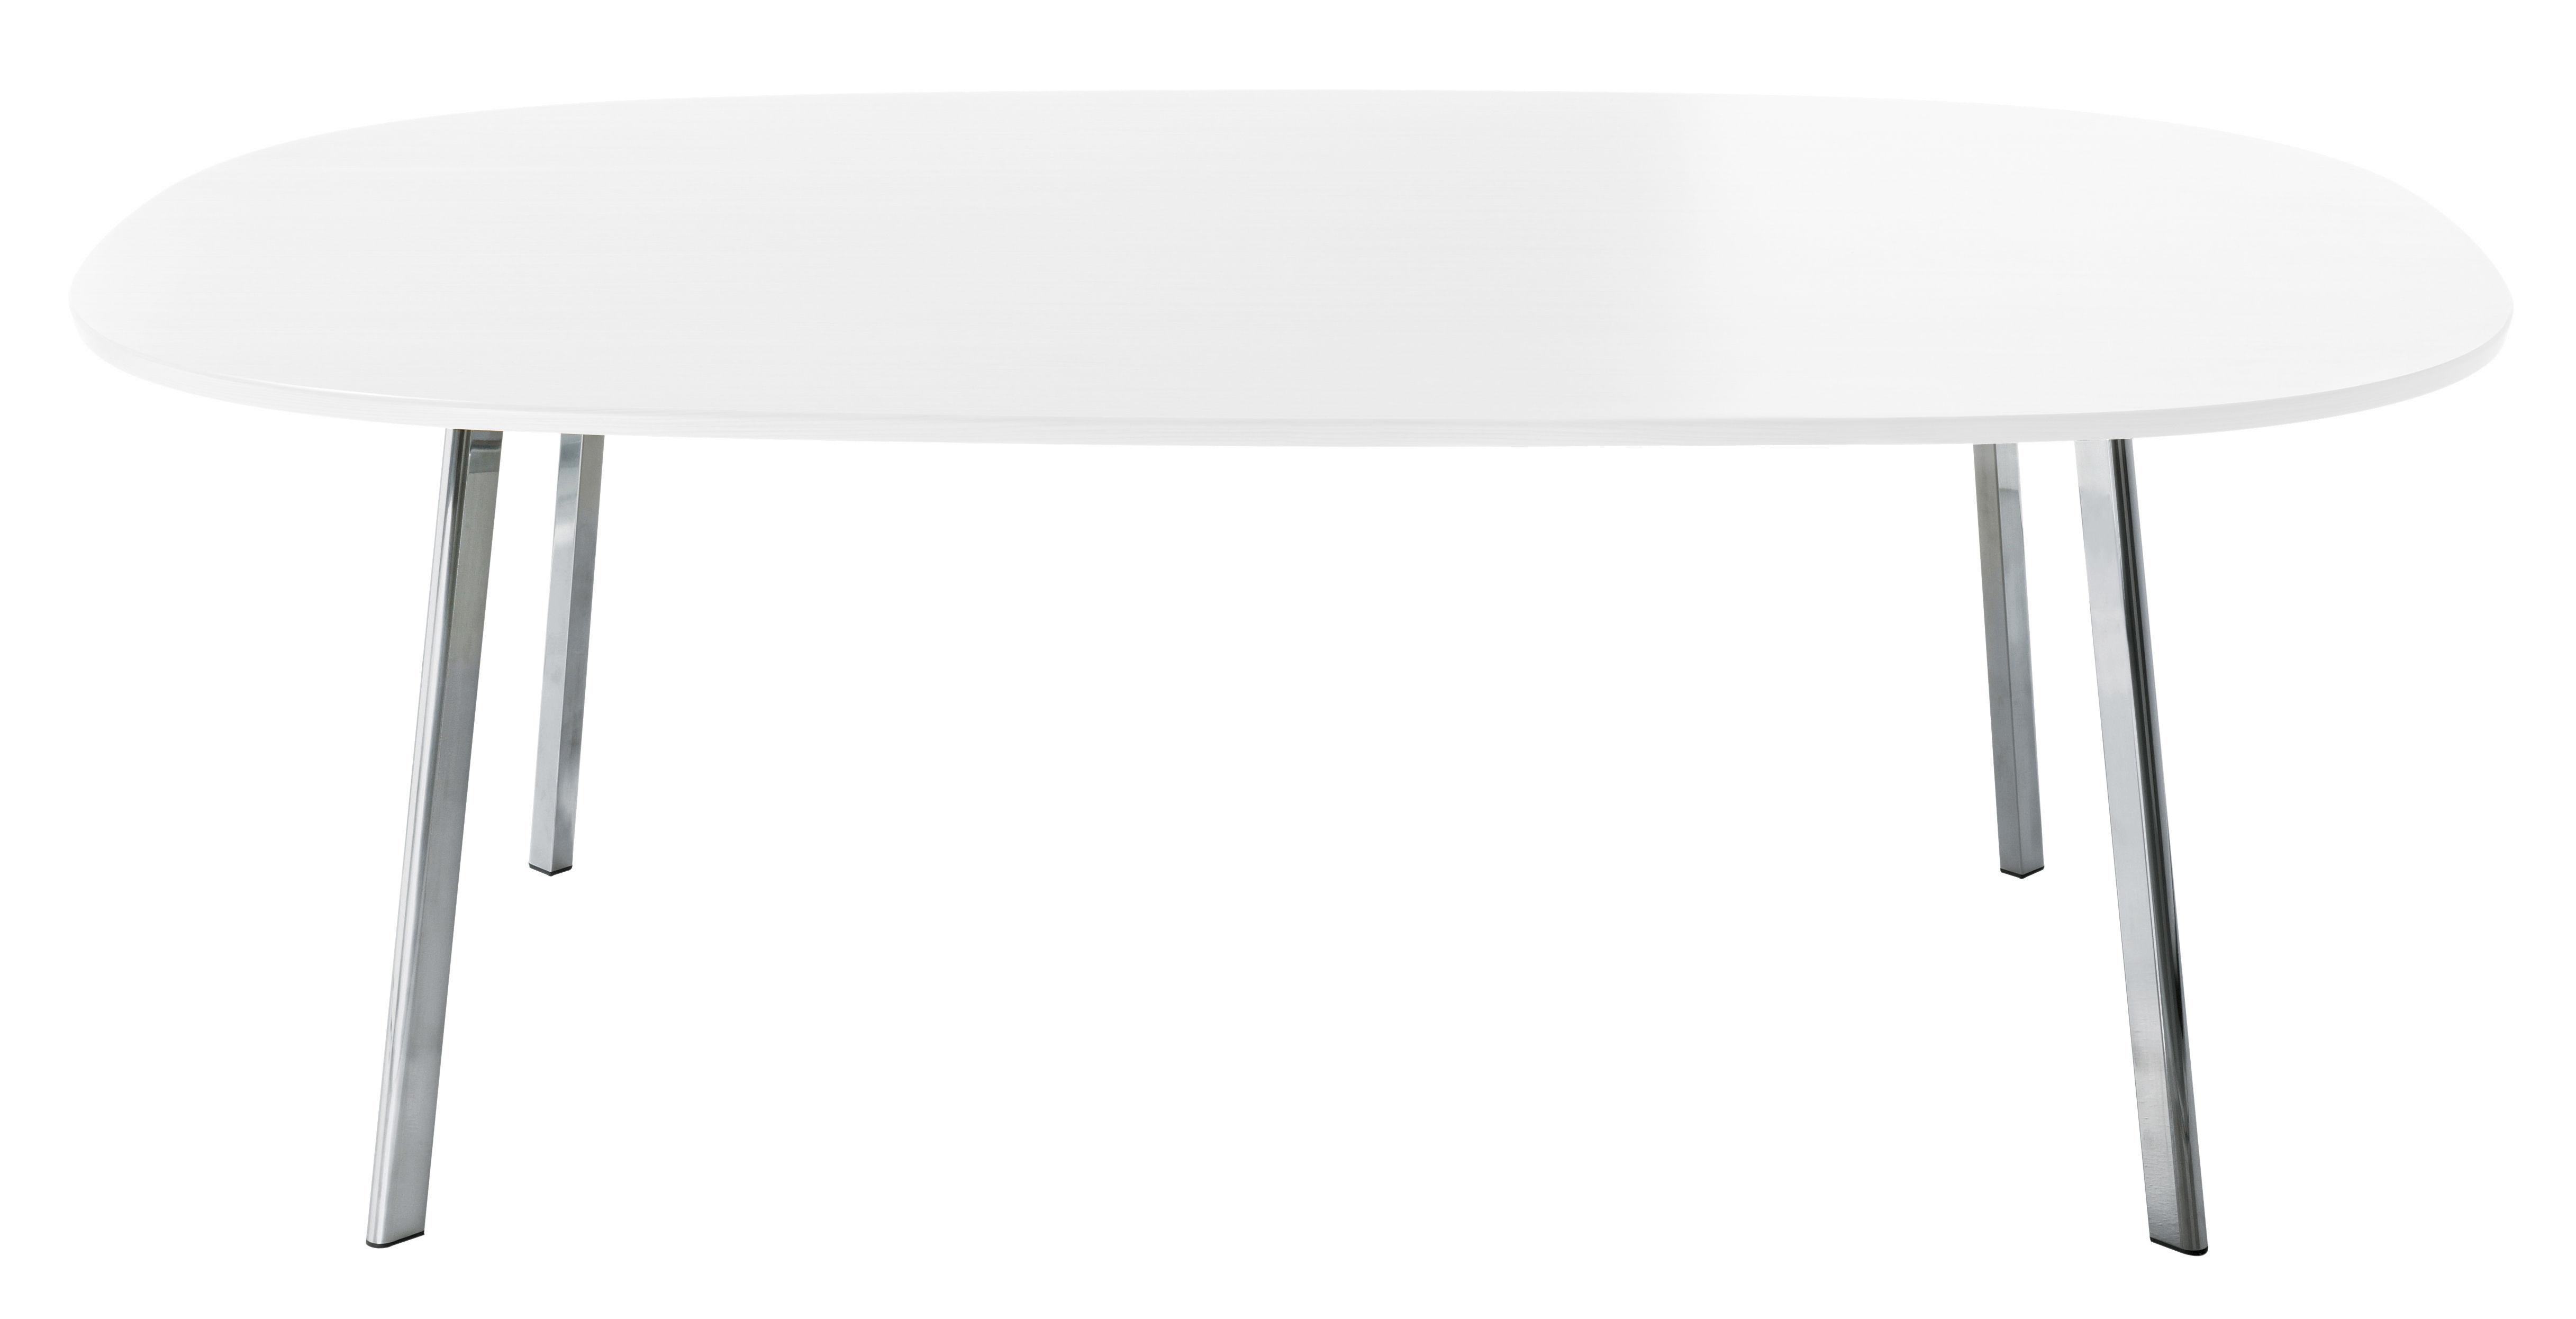 Möbel - Tische - Déjà-vu rechteckiger Tisch 160 cm - Magis - Platte: weiß - lackierte Holzfaserplatte, poliertes Aluminium